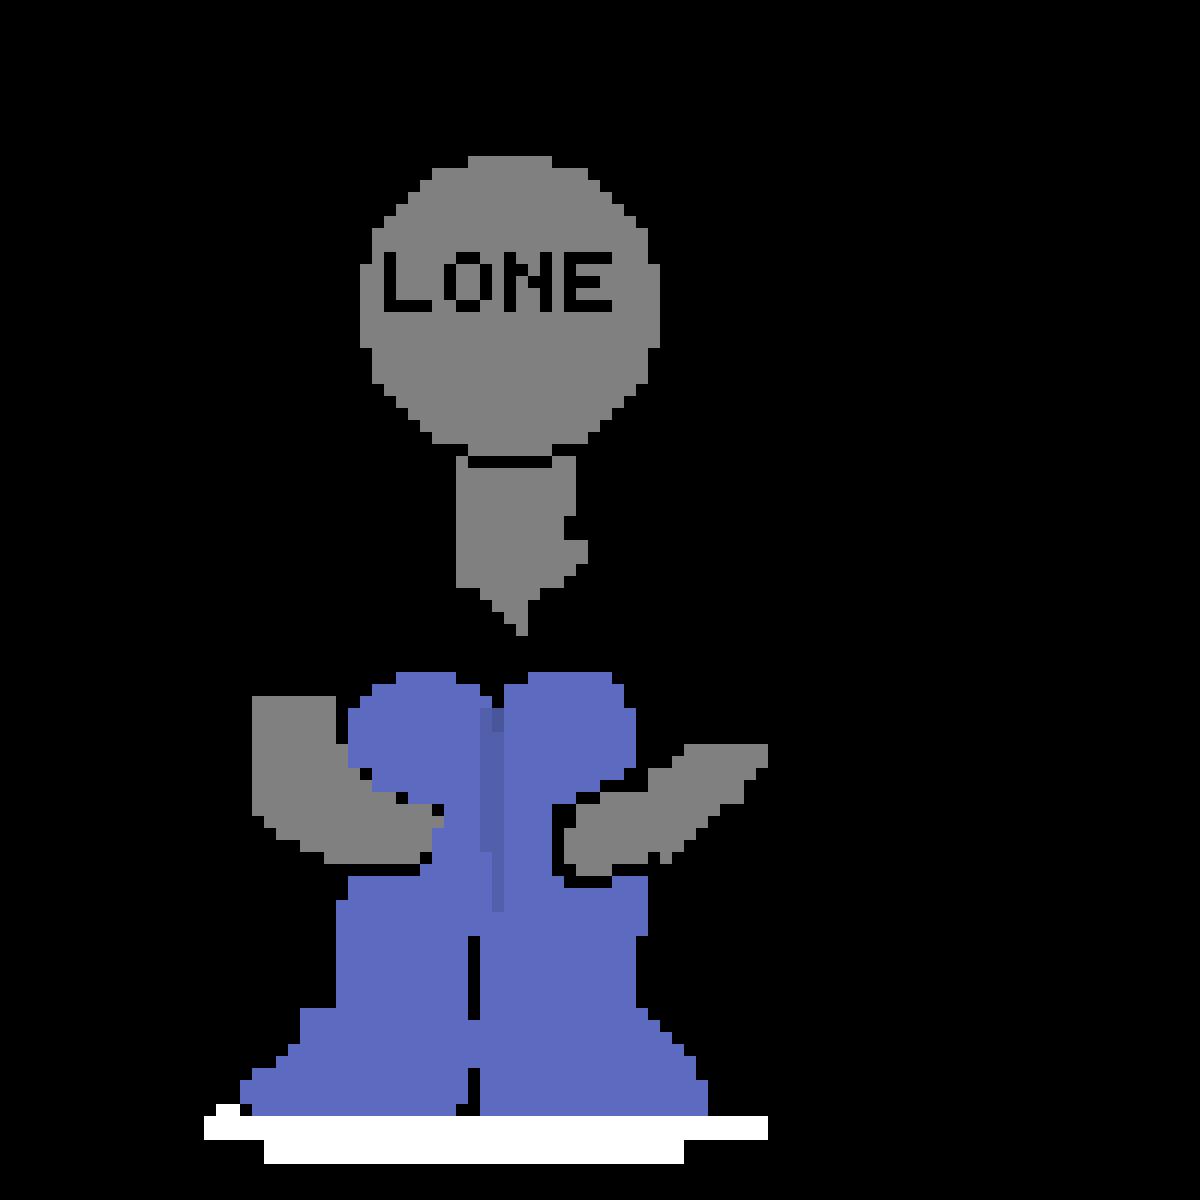 Lone by myavocados